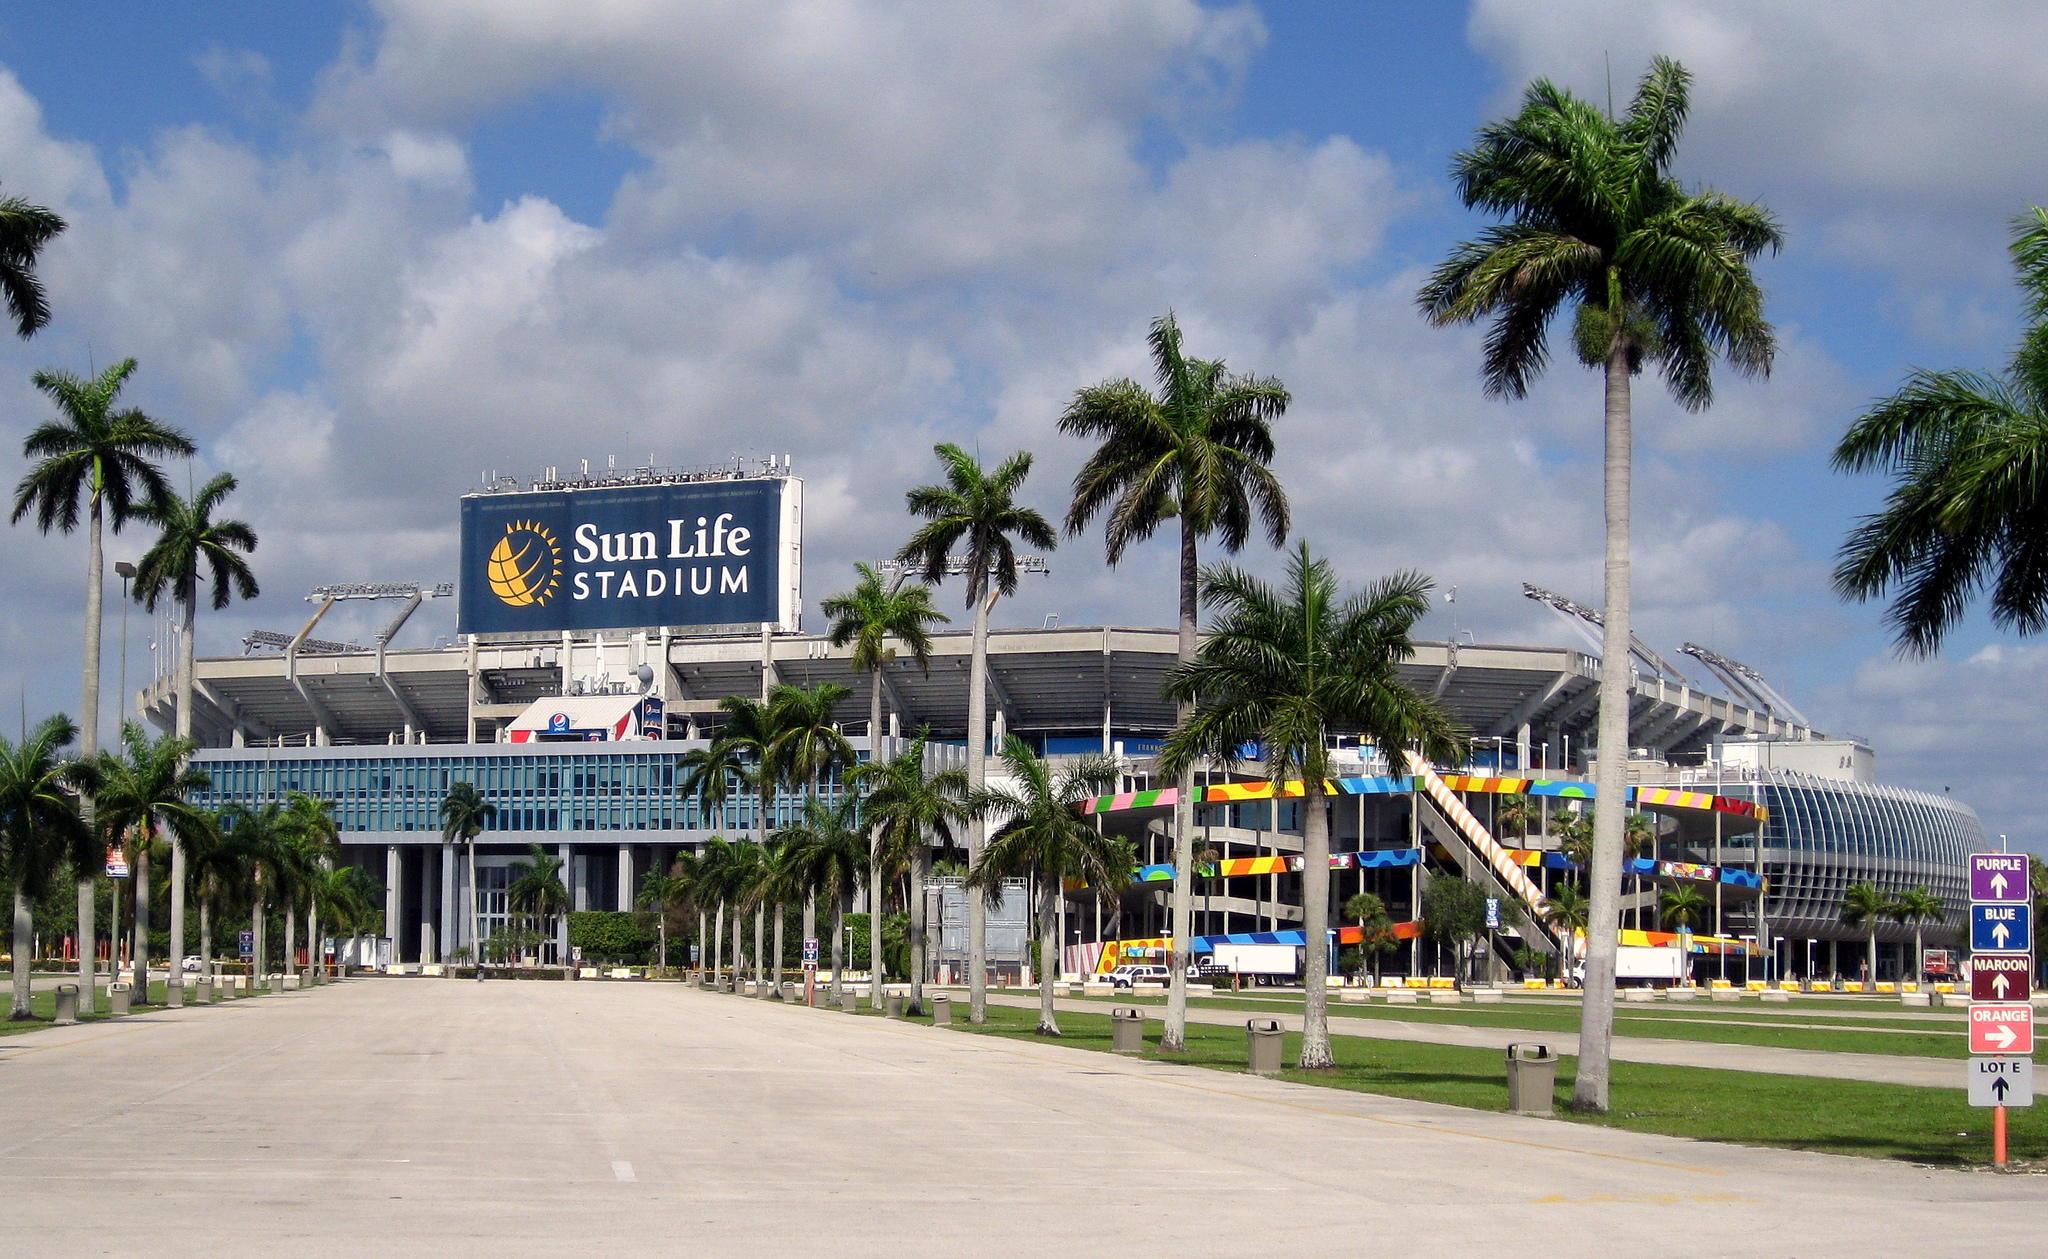 Hard Rock Stadium Miami Dolphins football stadium Stadiums of